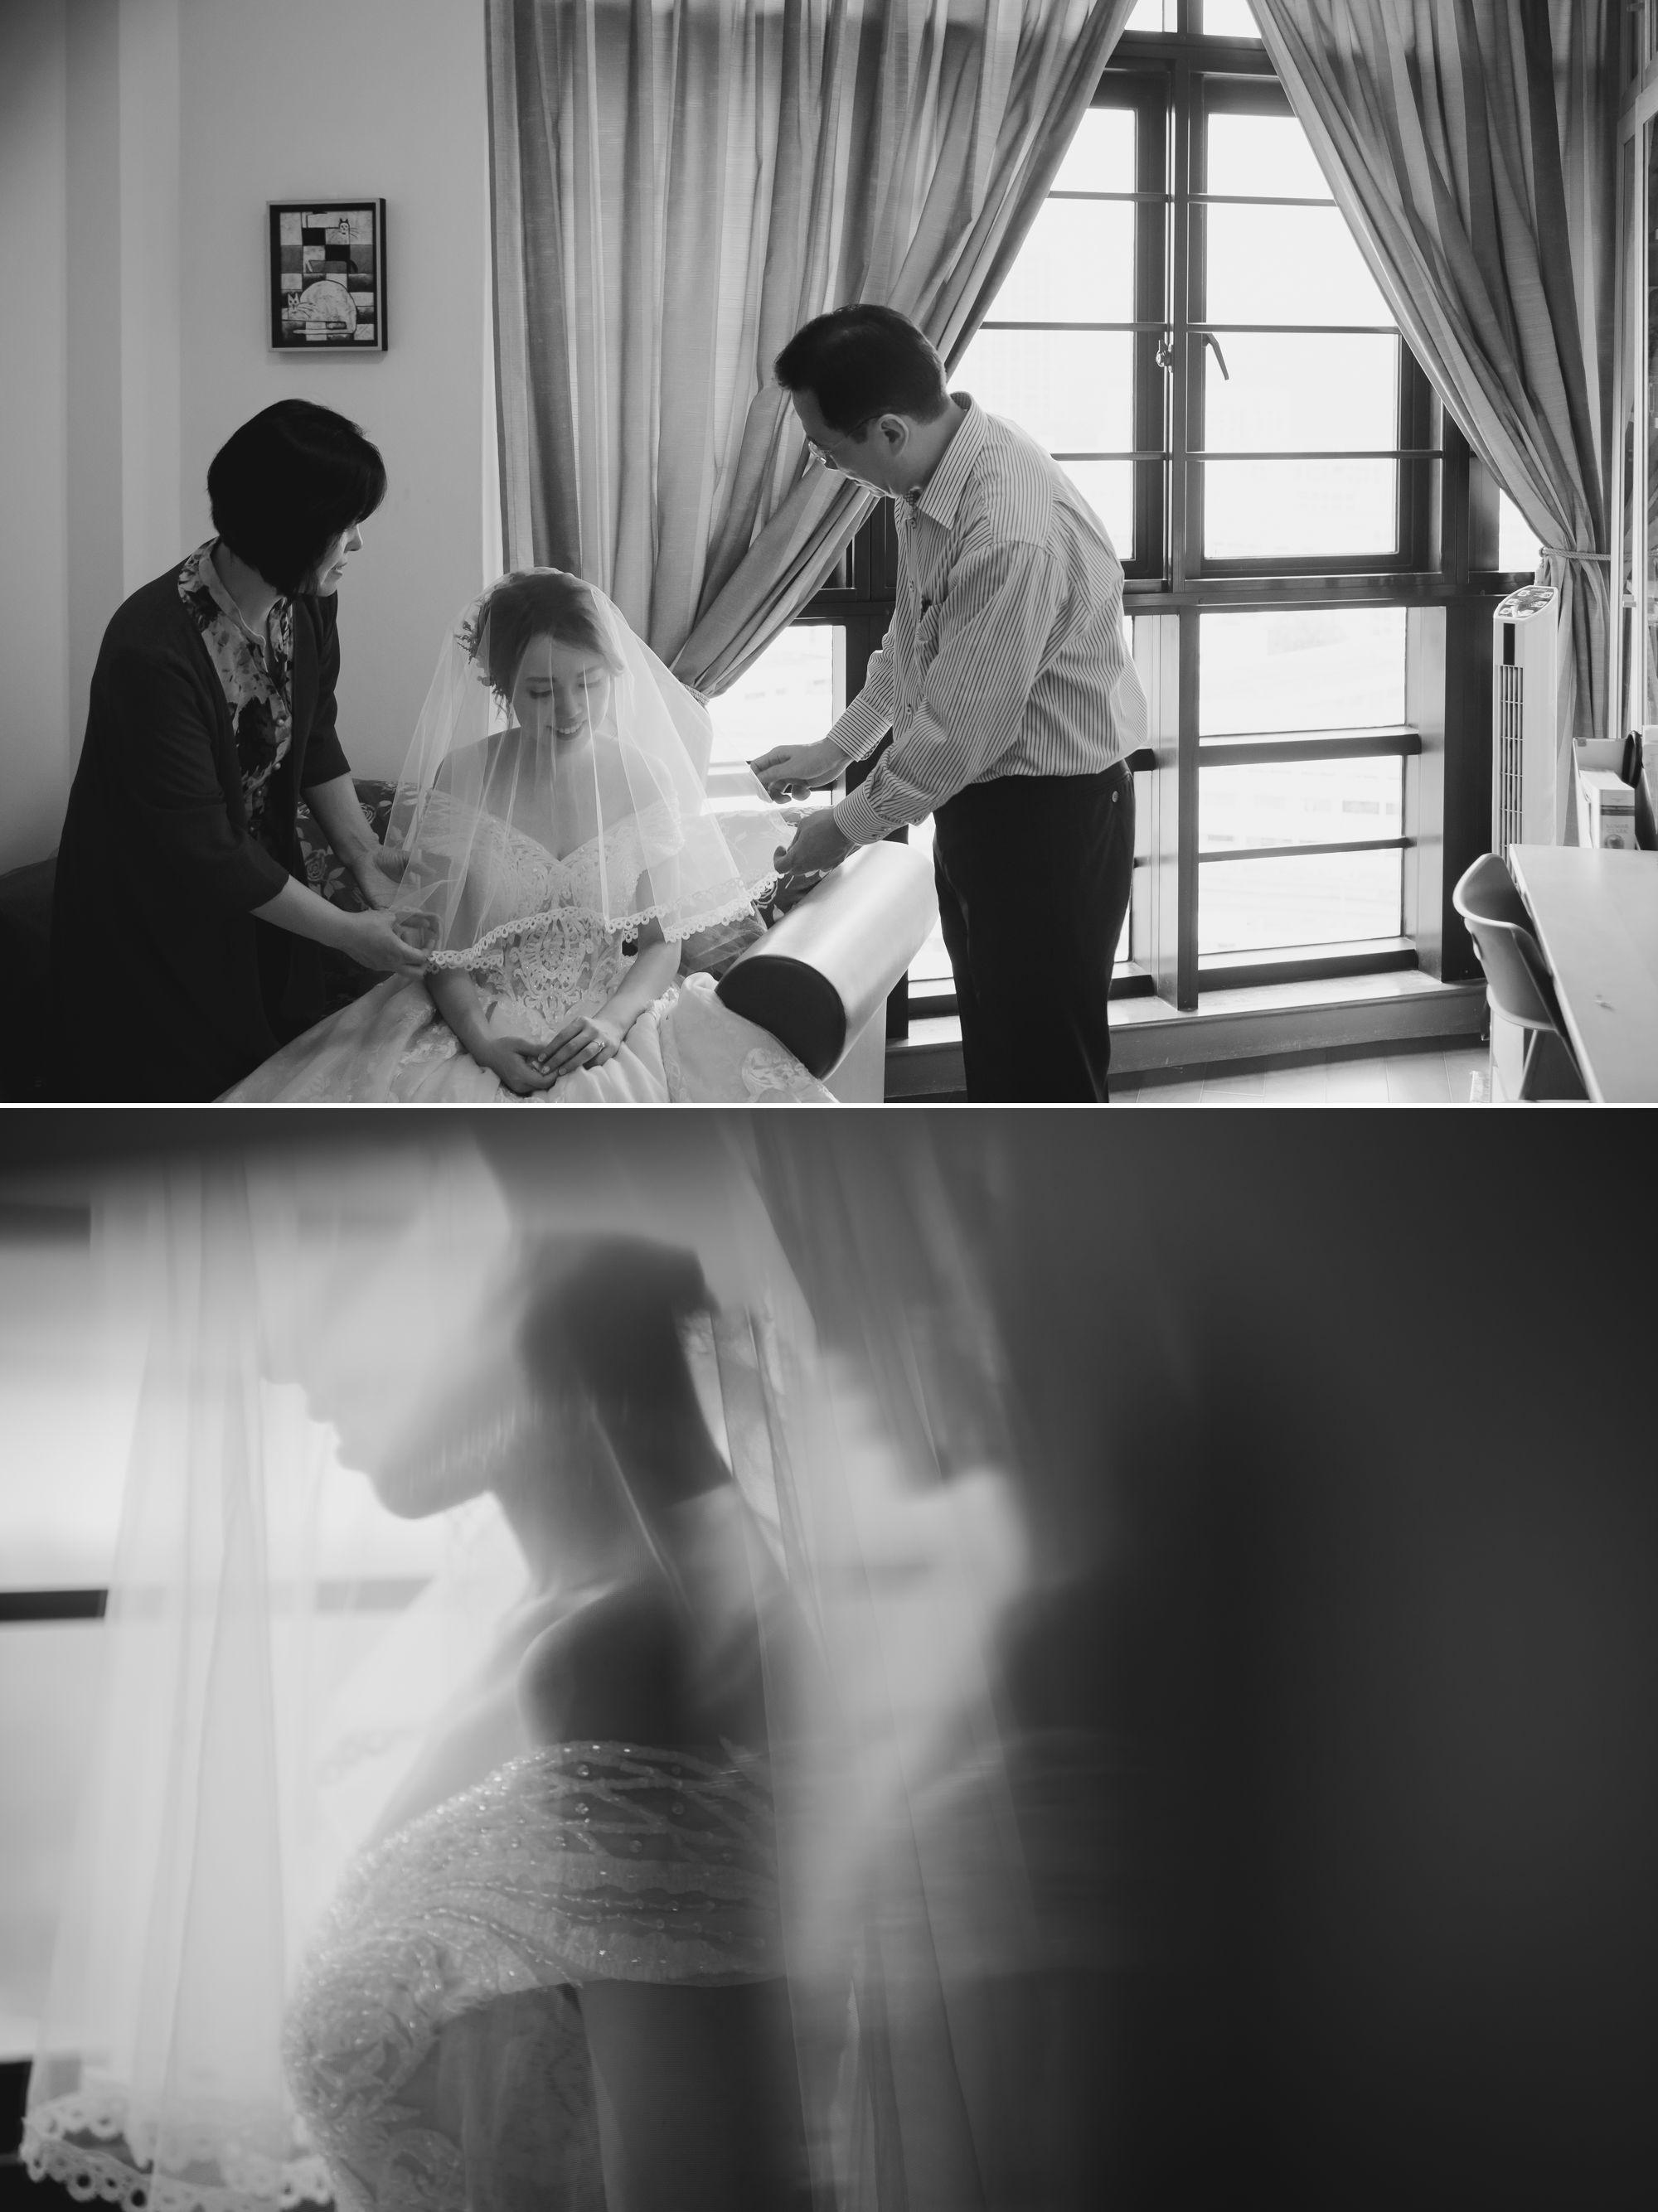 fullerton_singapore_photography_ 5.jpg